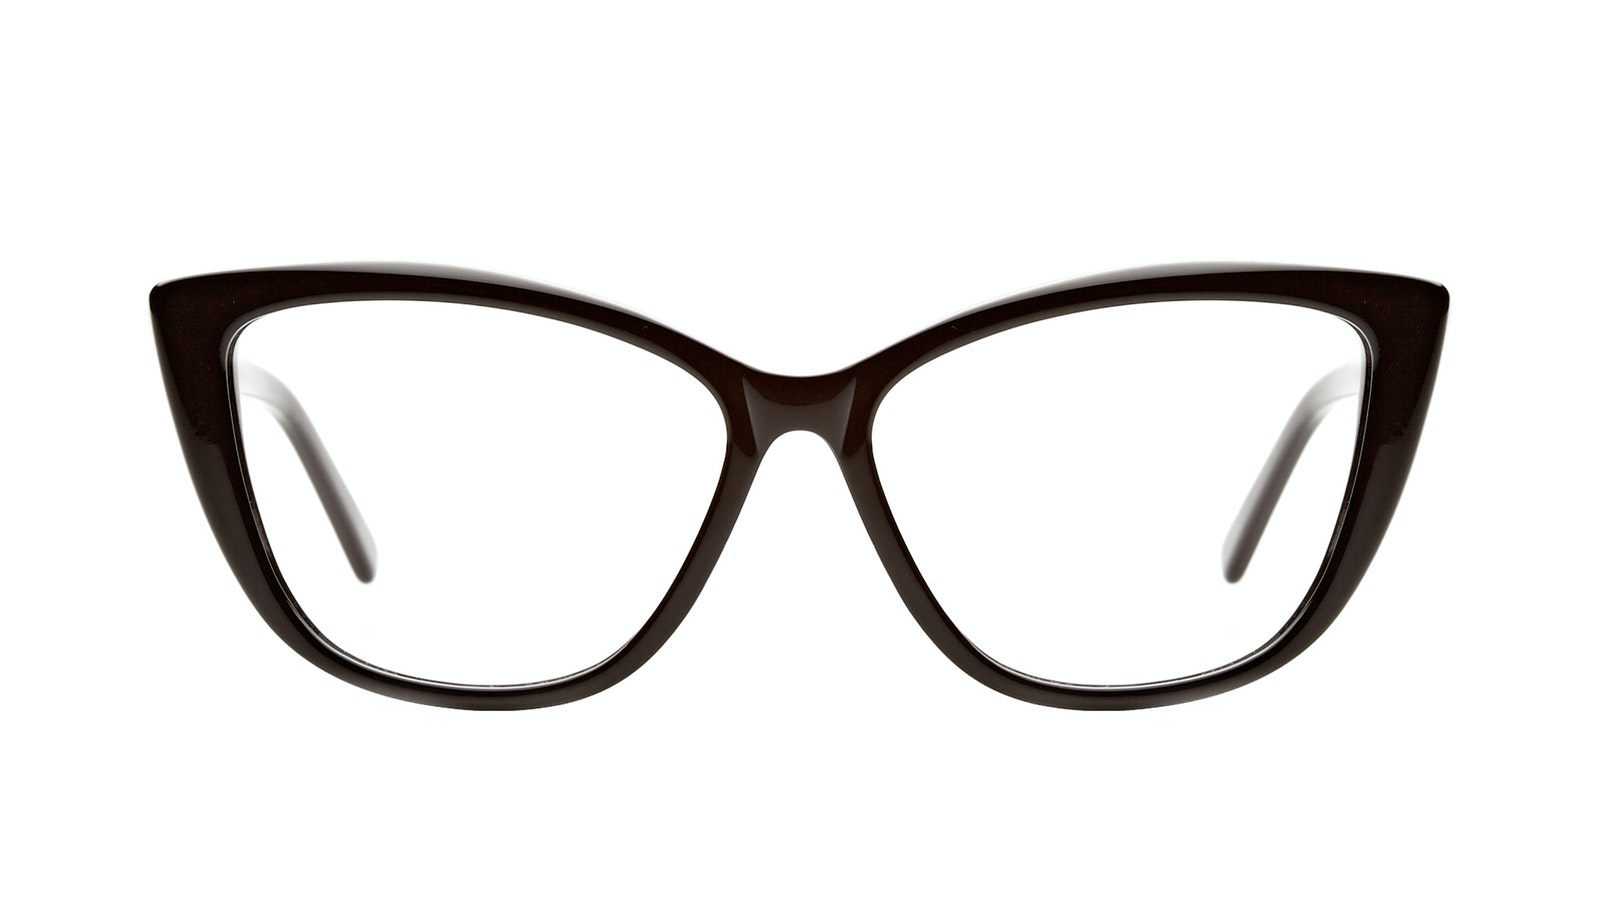 Affordable Fashion Glasses Cat Eye Daring Cateye Eyeglasses Women Dolled Up Black